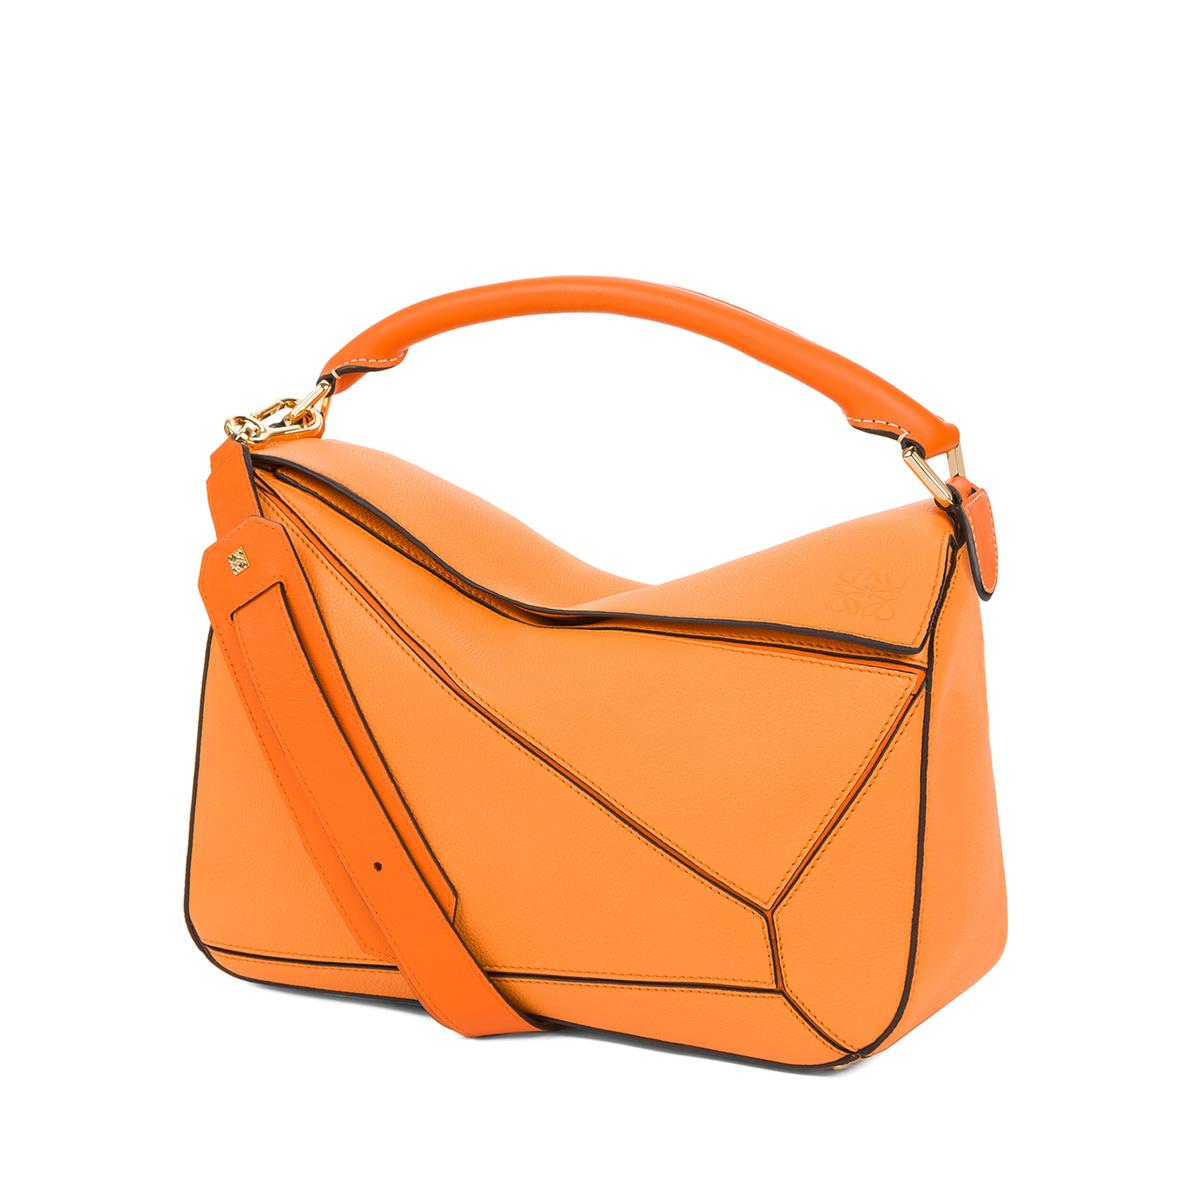 Puzzle Bag Apricot/Orange - LOEWE